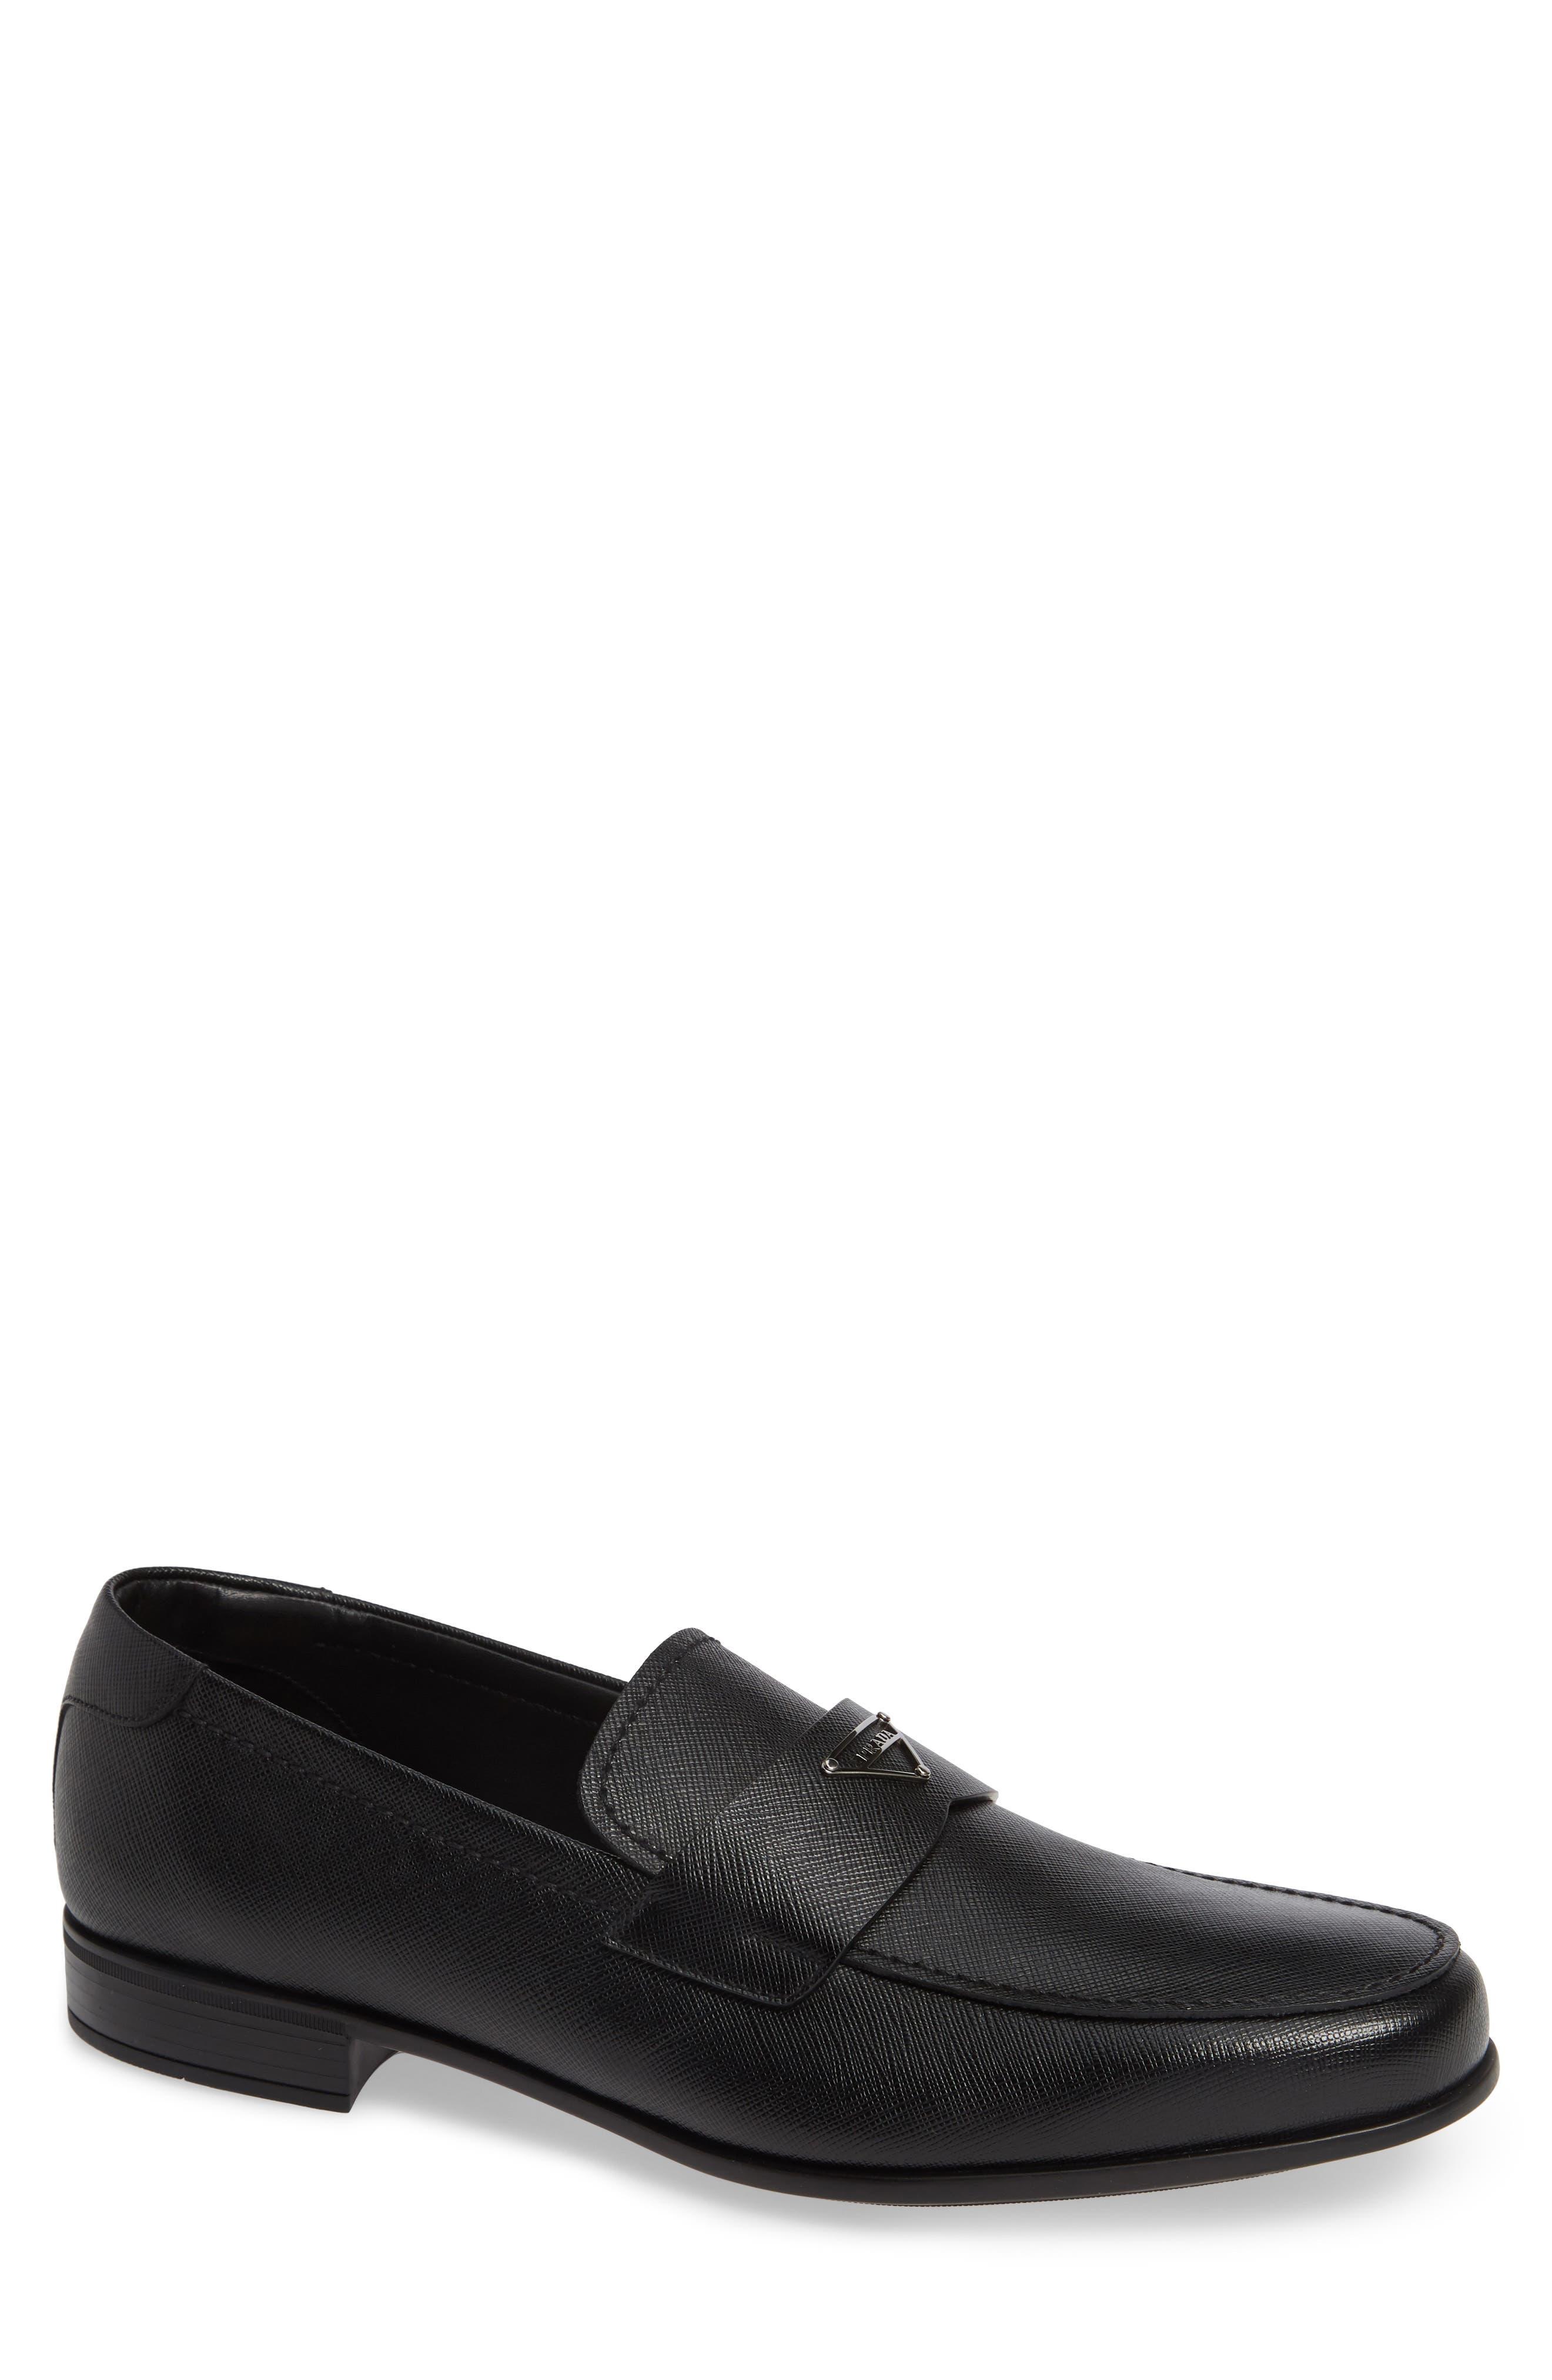 Men's Prada Loafers \u0026 Slip-Ons | Nordstrom